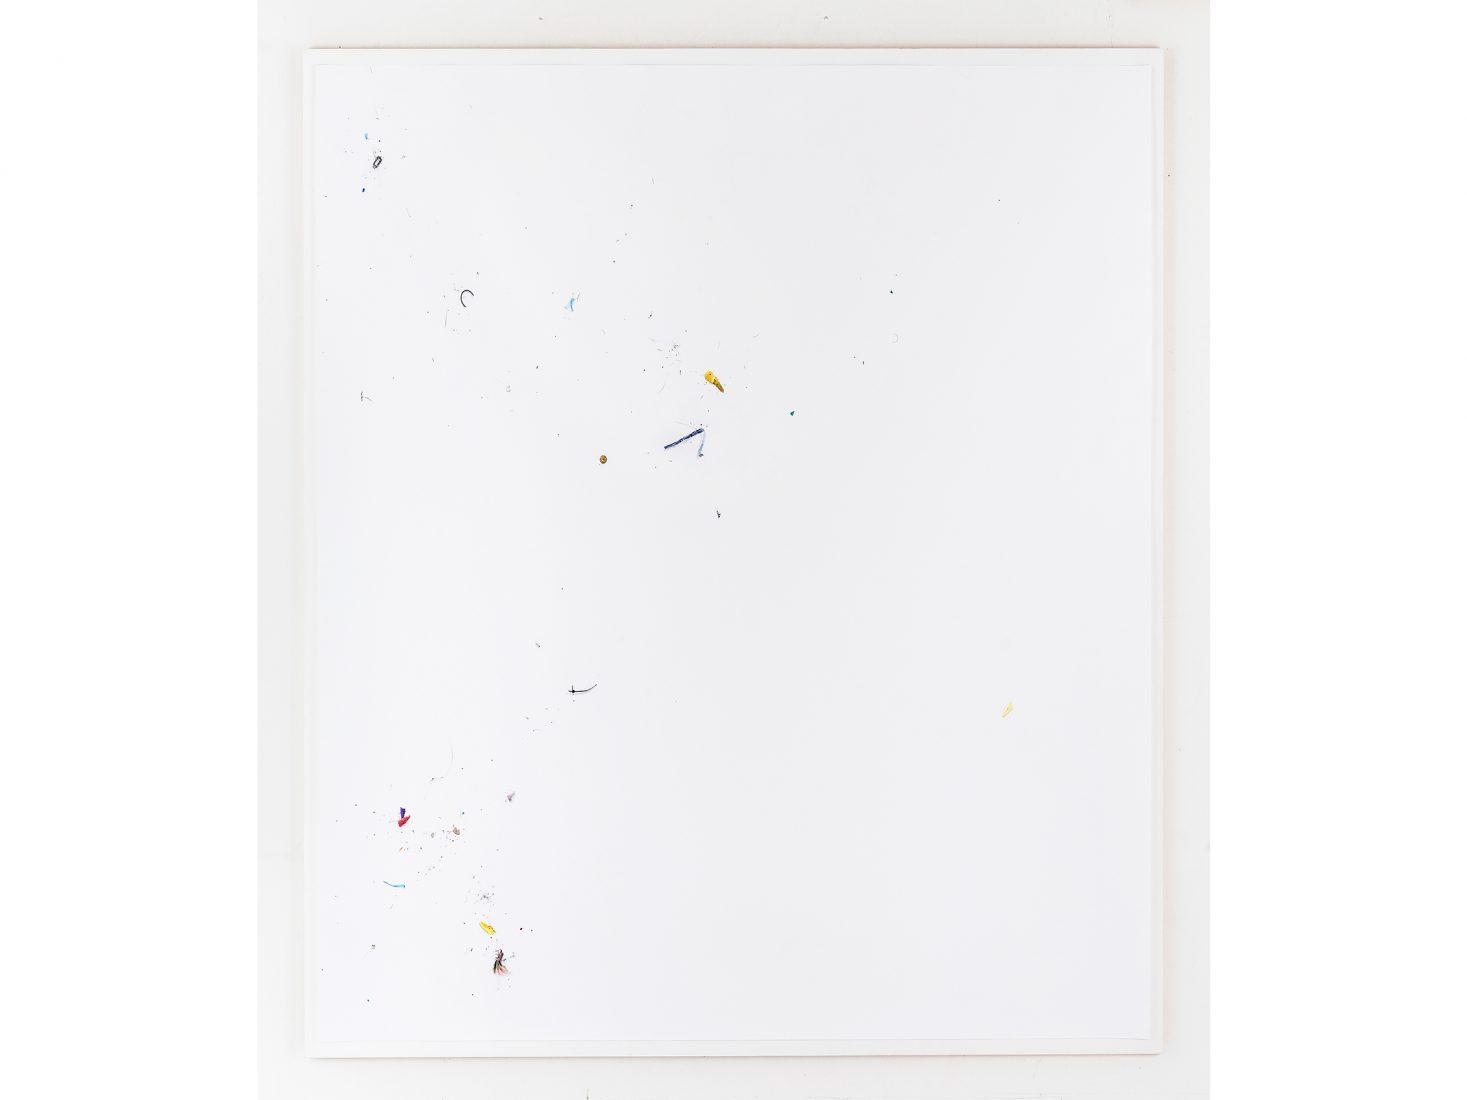 Michail Michailov. Dust to Dust#101, 2020, coloured pencil on paper, 138x138 cm